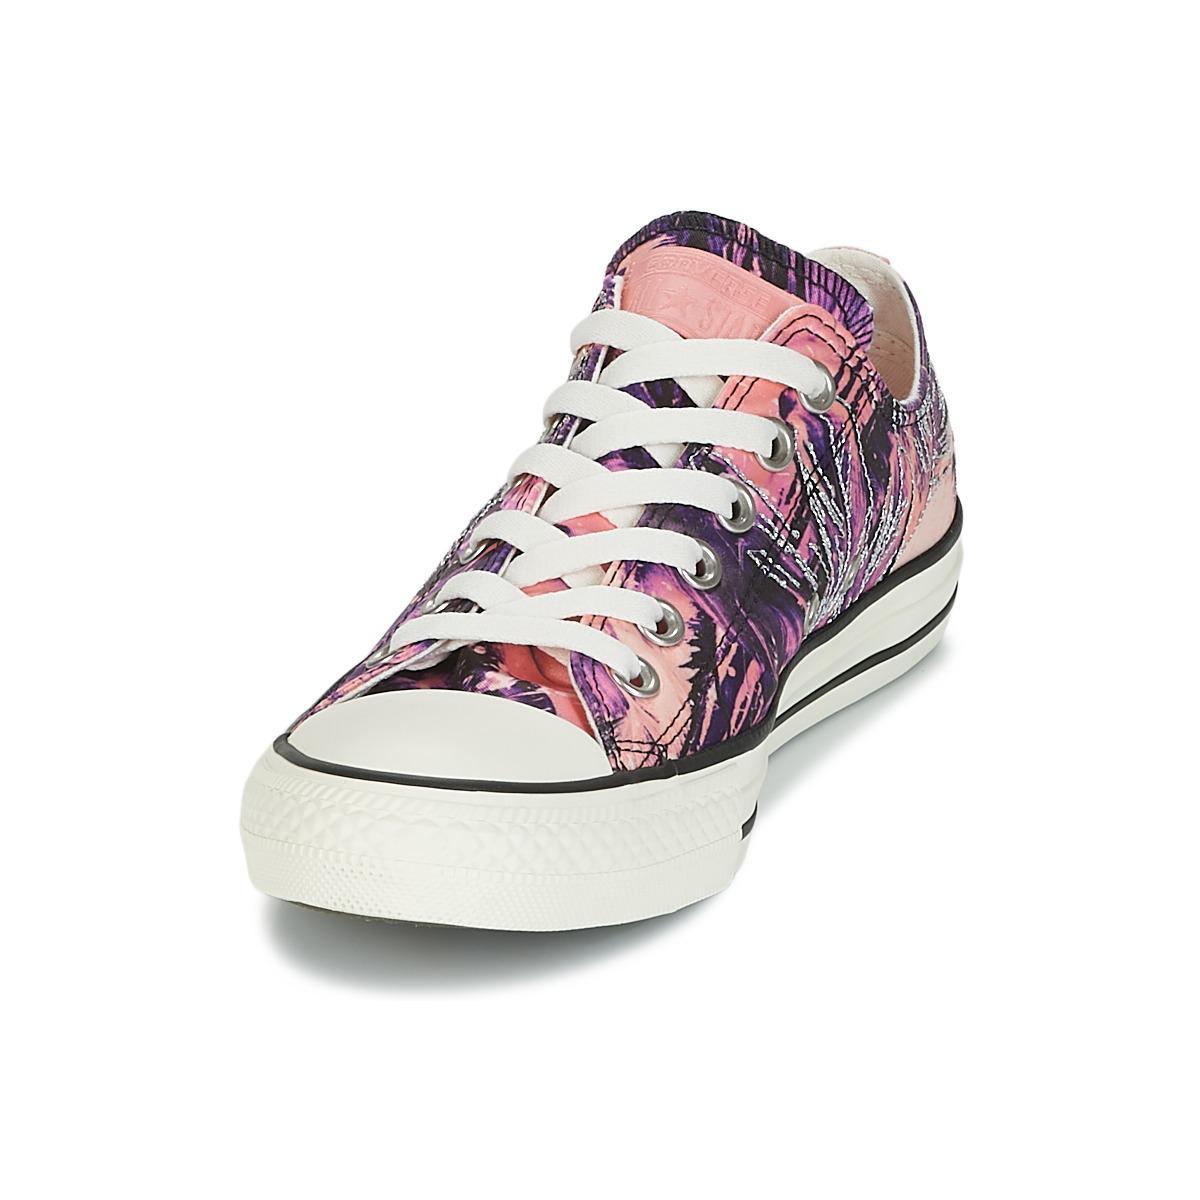 d6bdfa3909b1 Converse Chuck Taylor All Star Ox Feather Print Women s Shoes ...